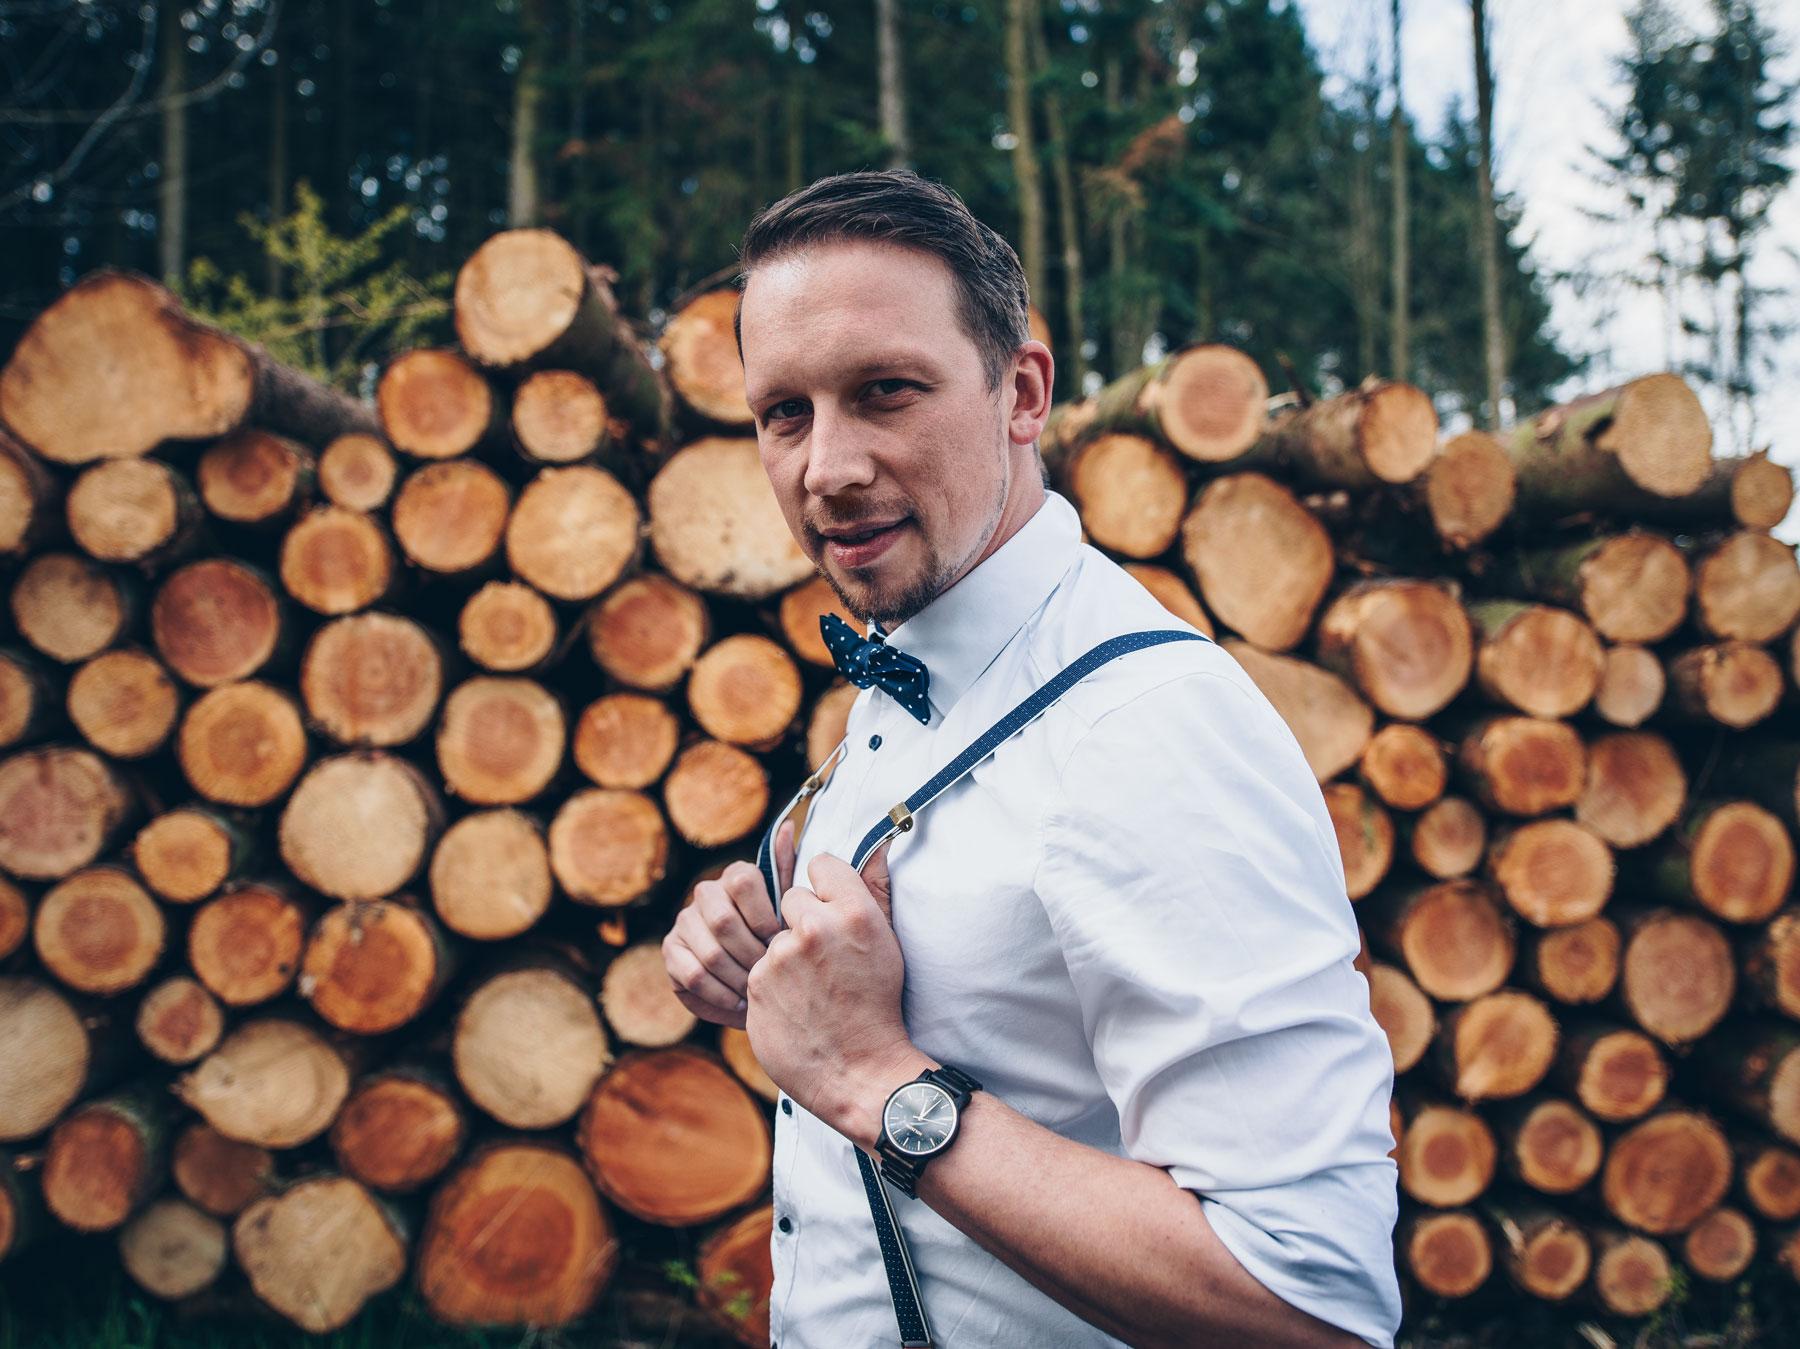 Hochzeitsfotograf Esslingen - Oliver Schmidt